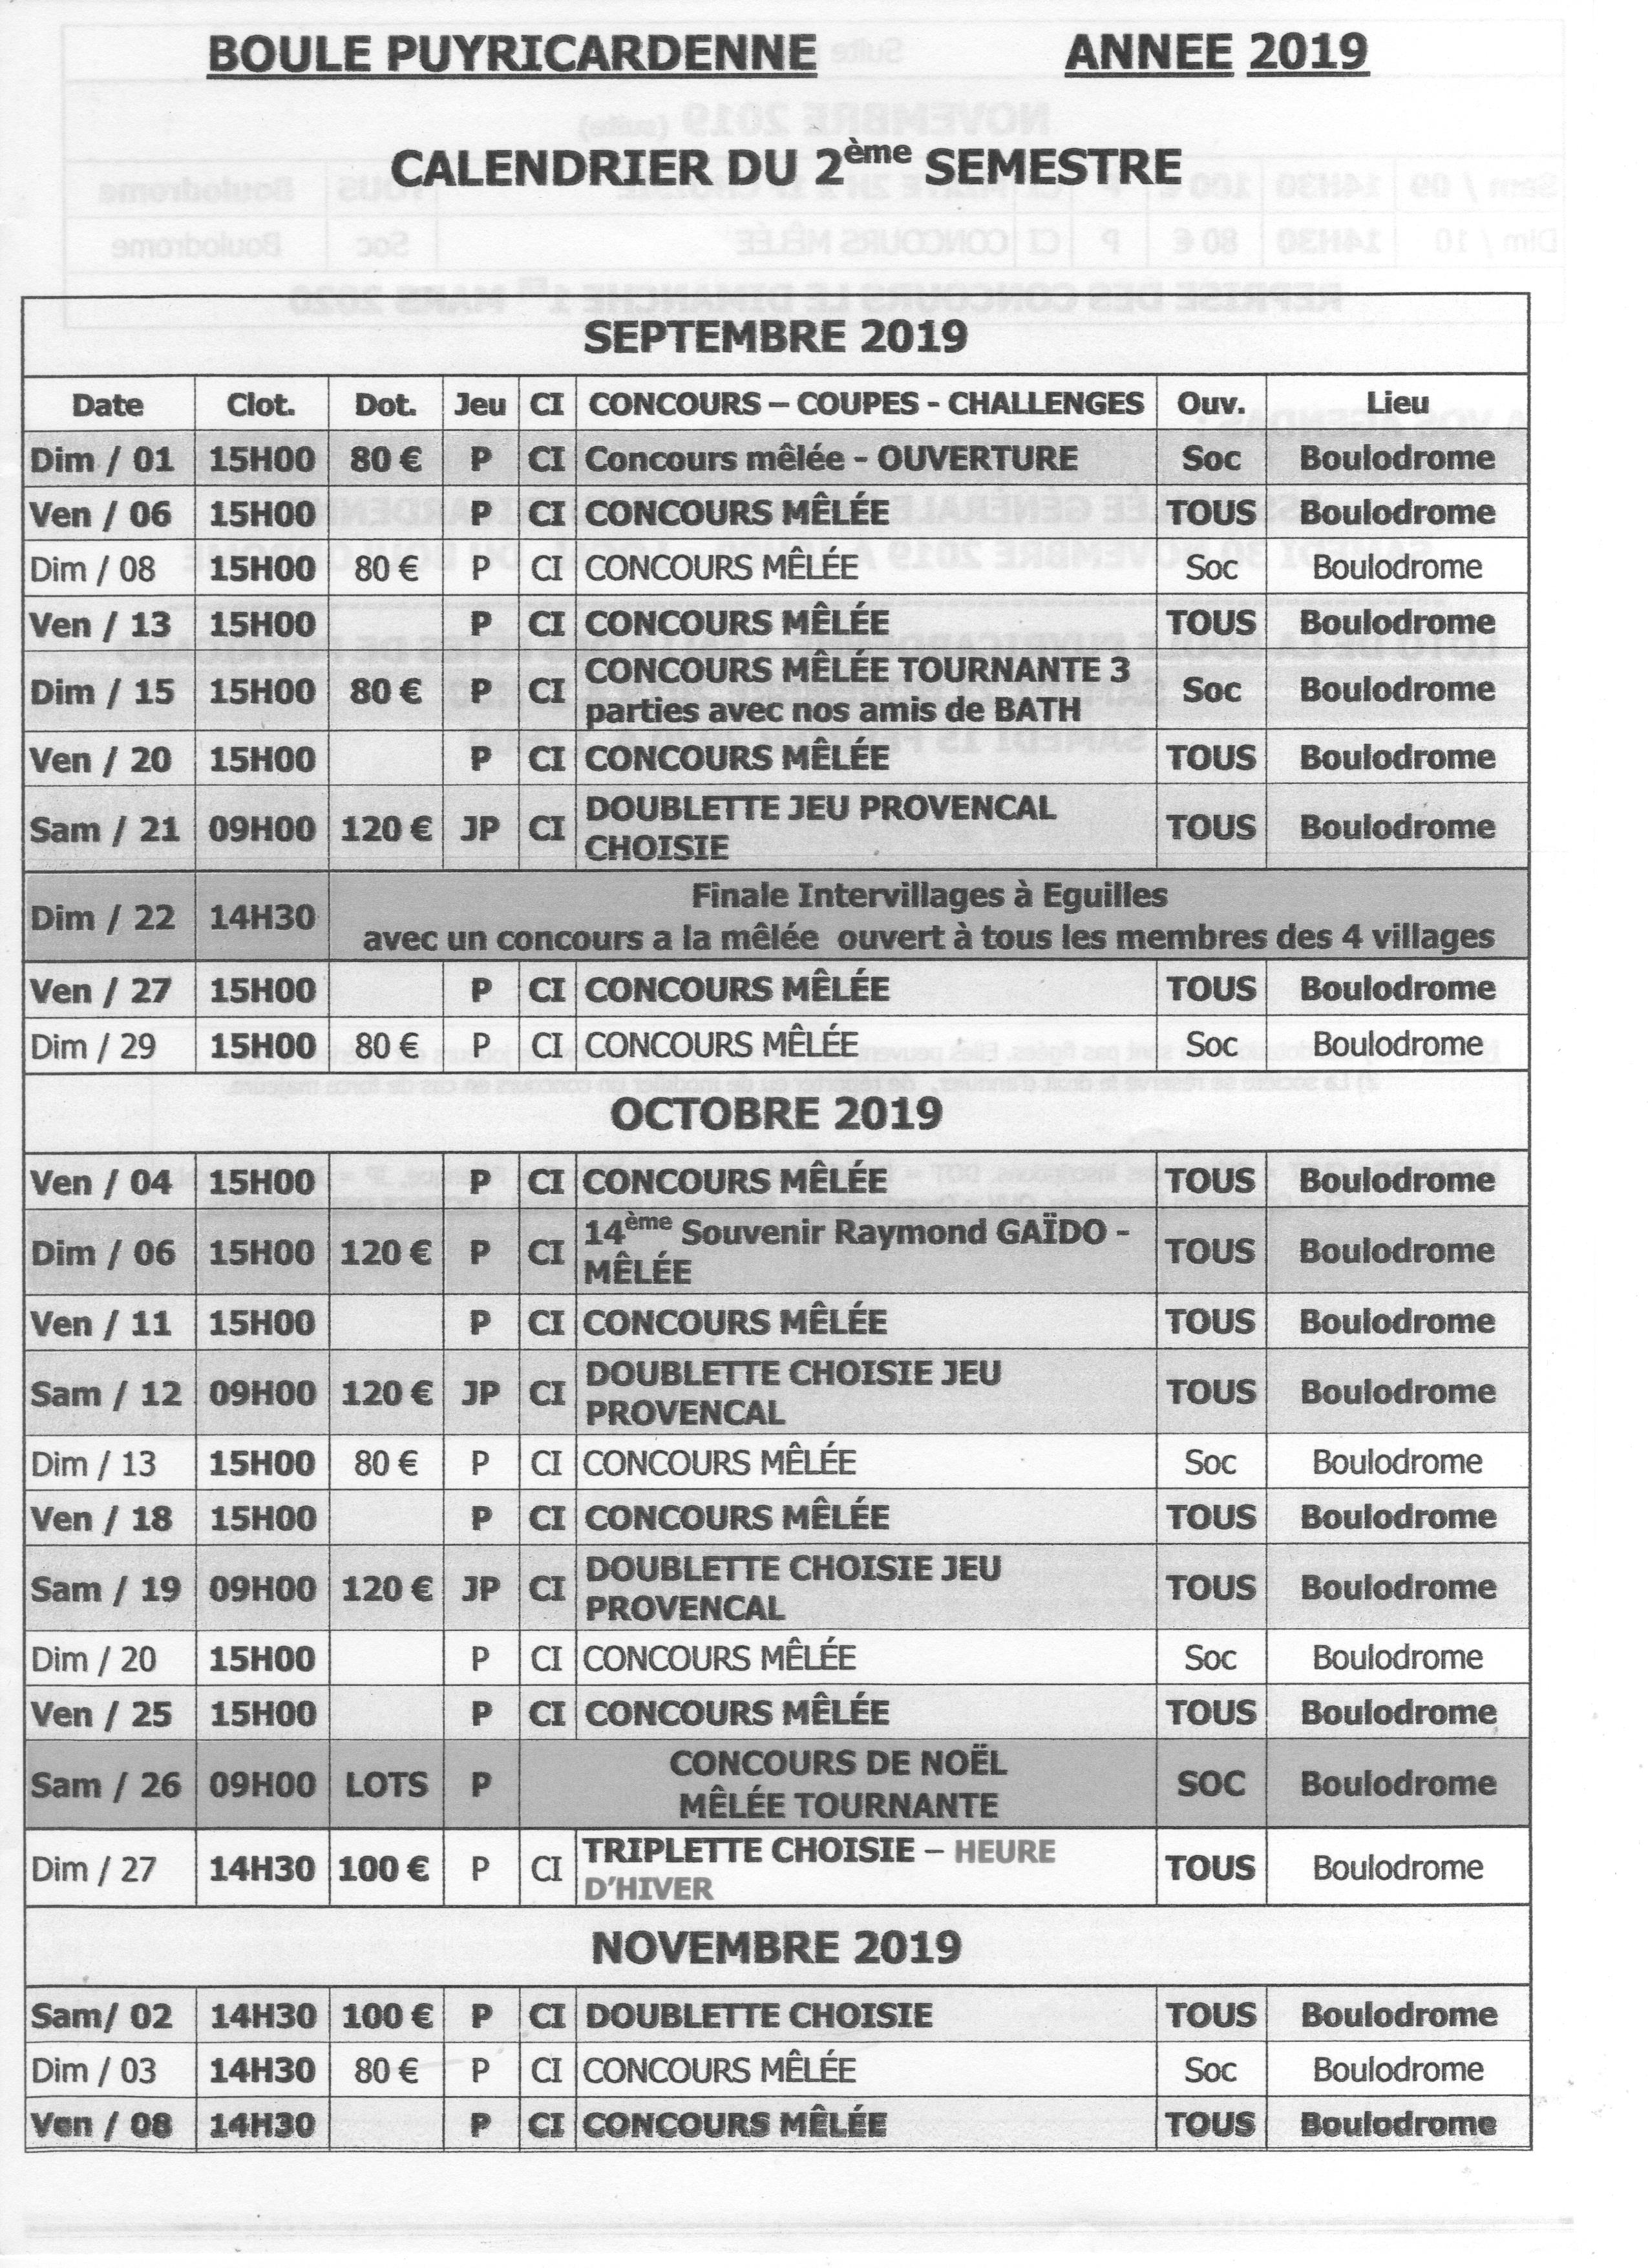 Calendrier 2019 2eme Semestre.Puyricard Calendrier 2eme Semestre 2019